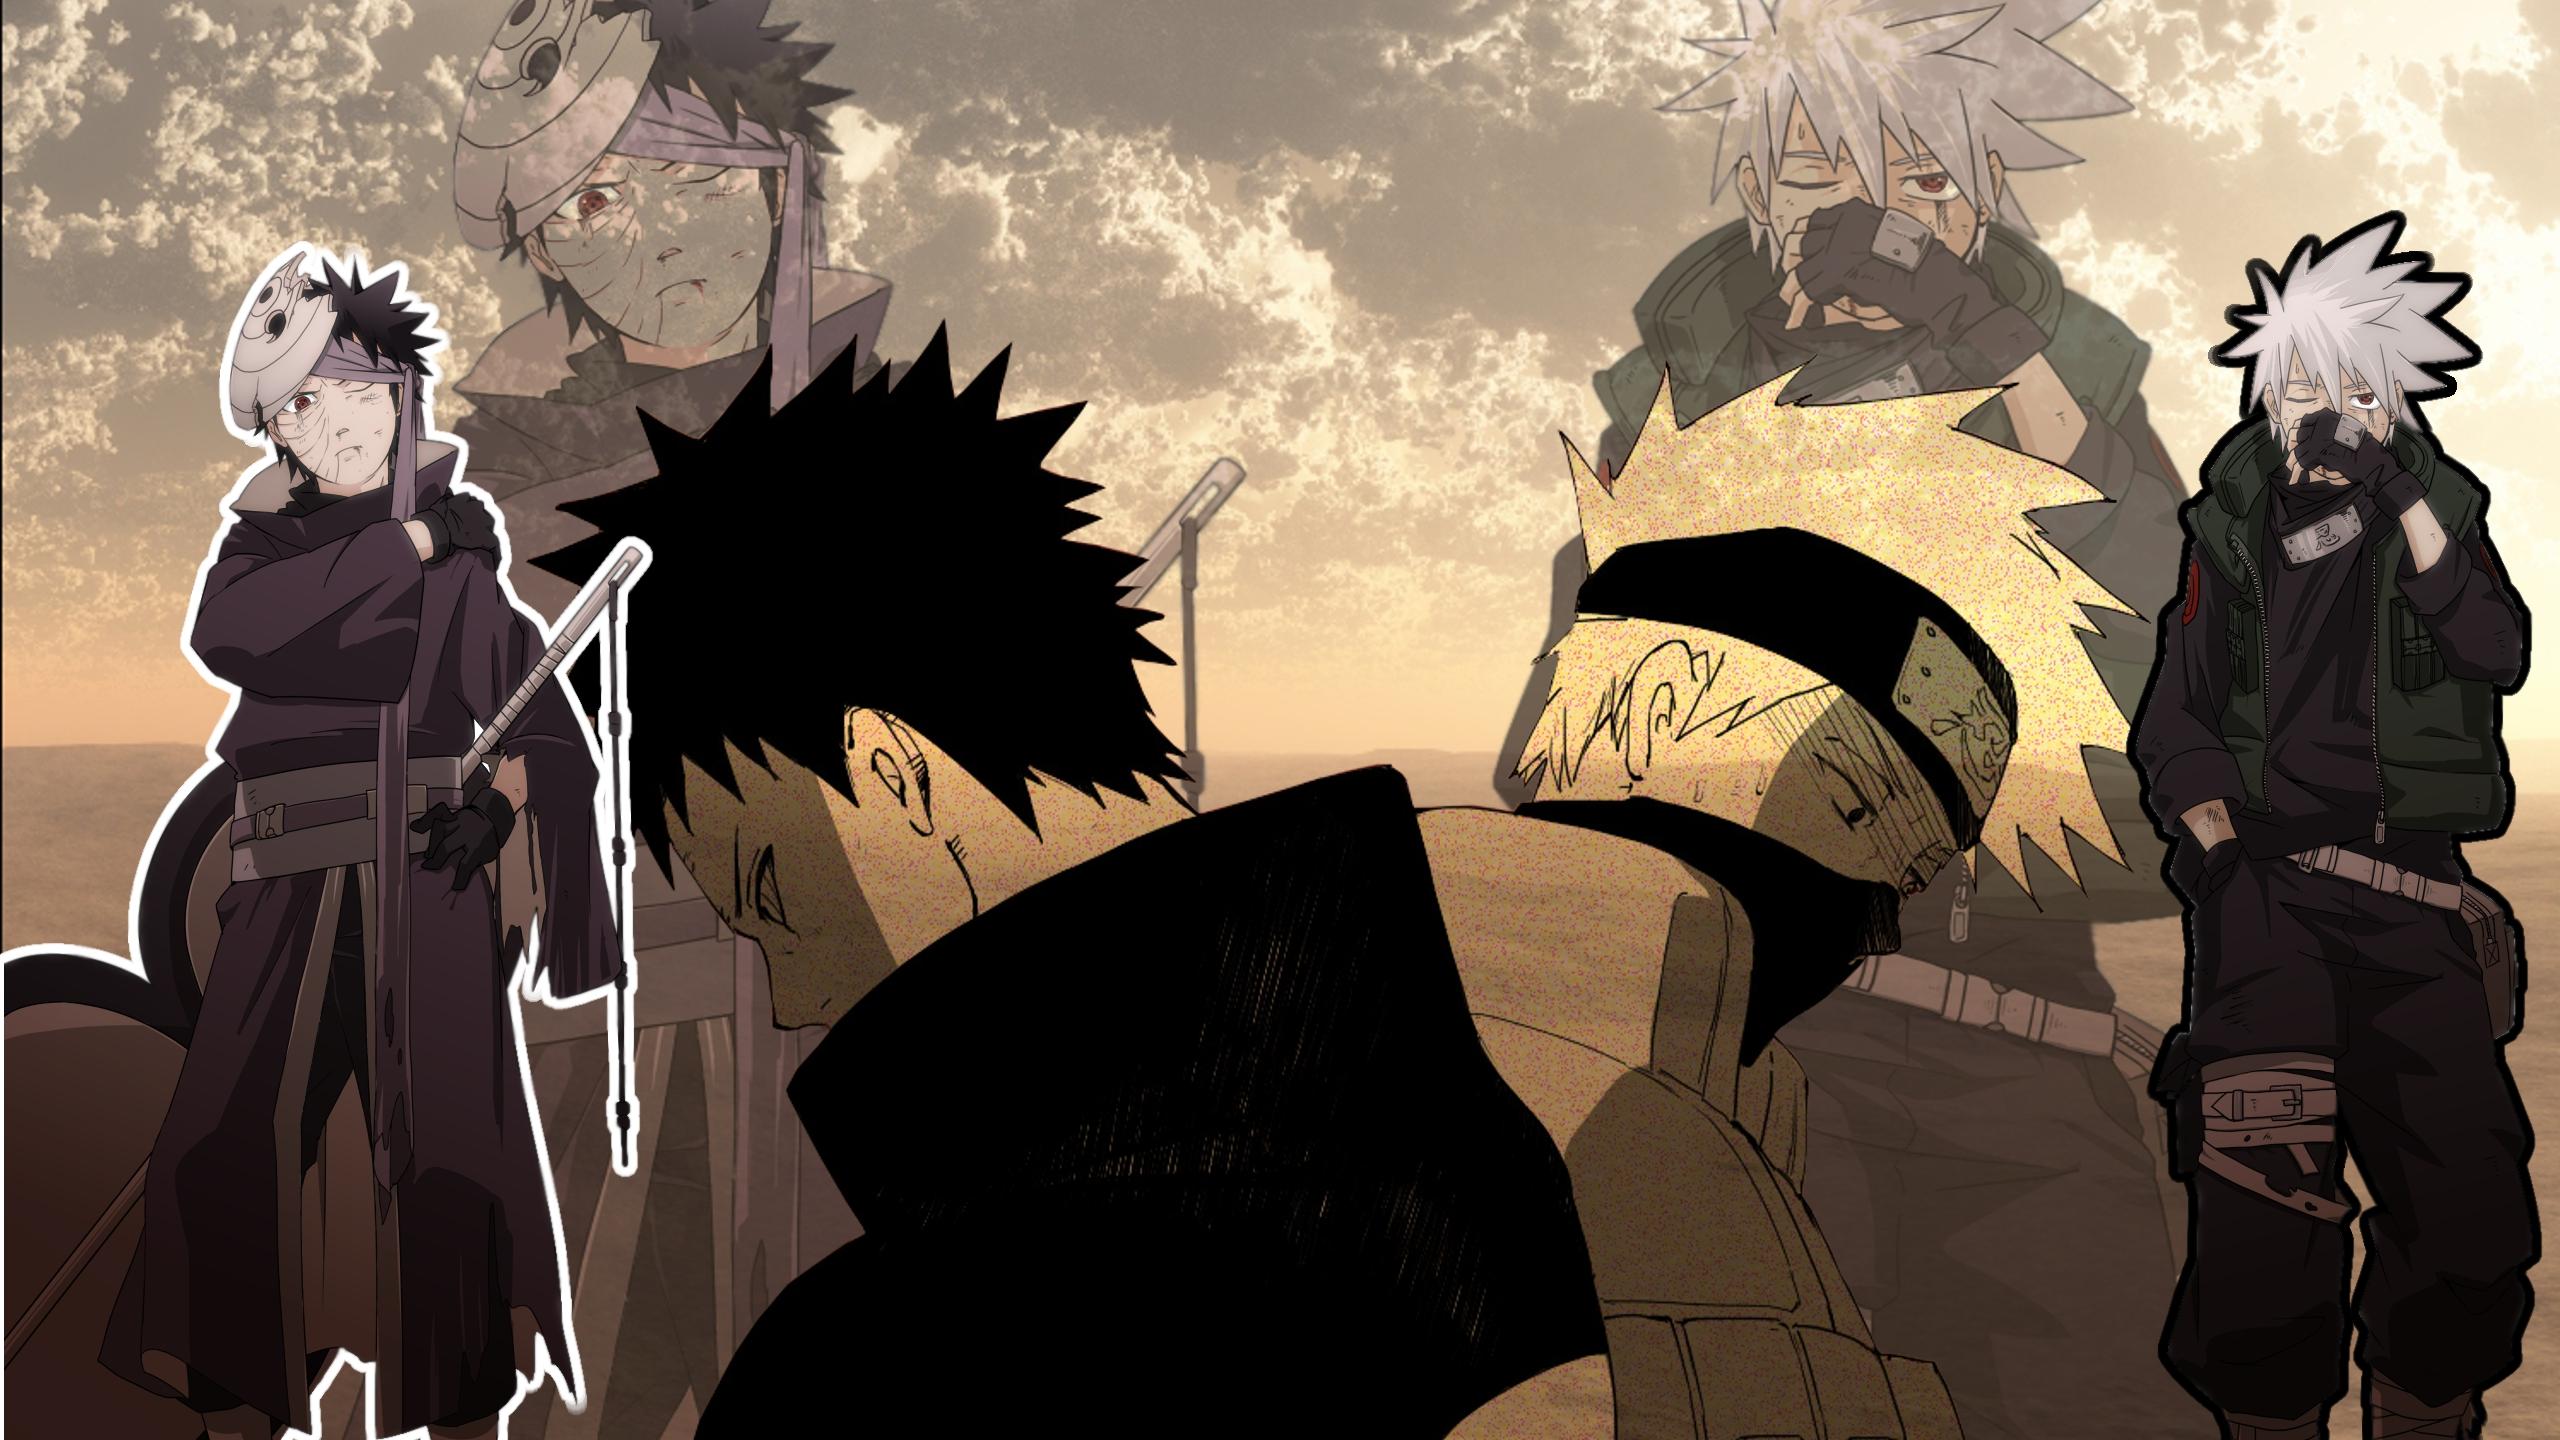 Kakashi kills Rin  Rins Death  Kakashi and Obito Unlock Mangekyou Sharingan  English Dub